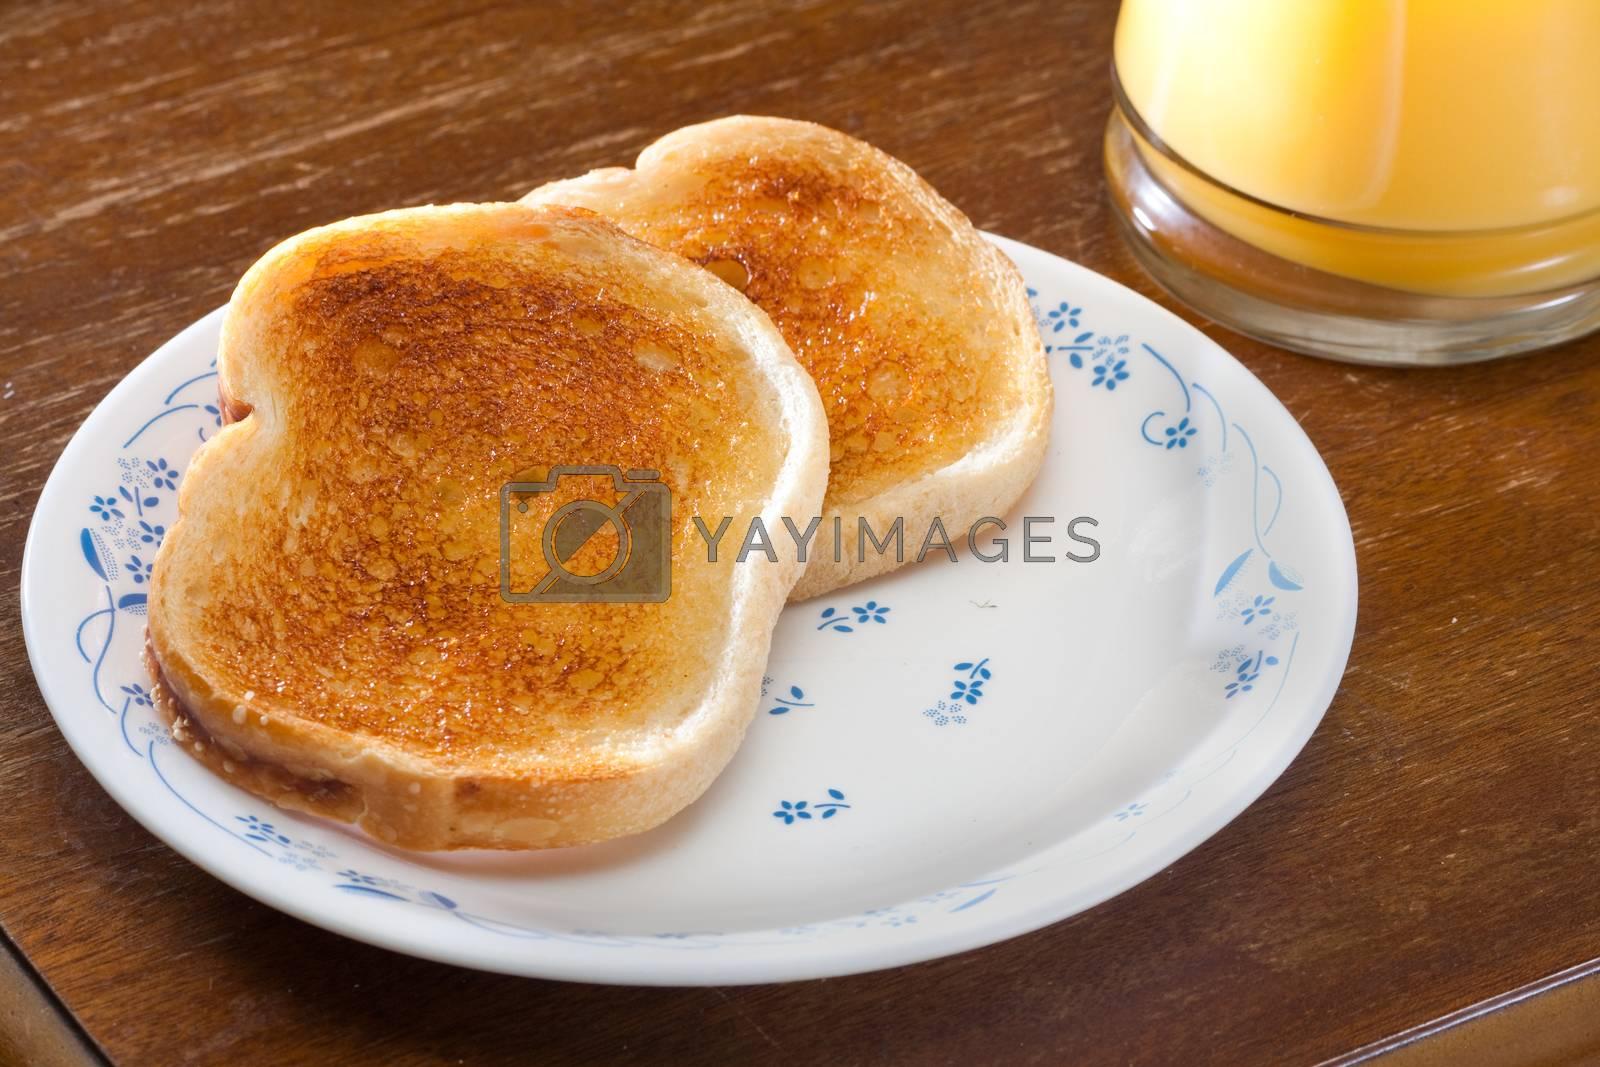 Nice breakfast of toast and orange juice ready to eat